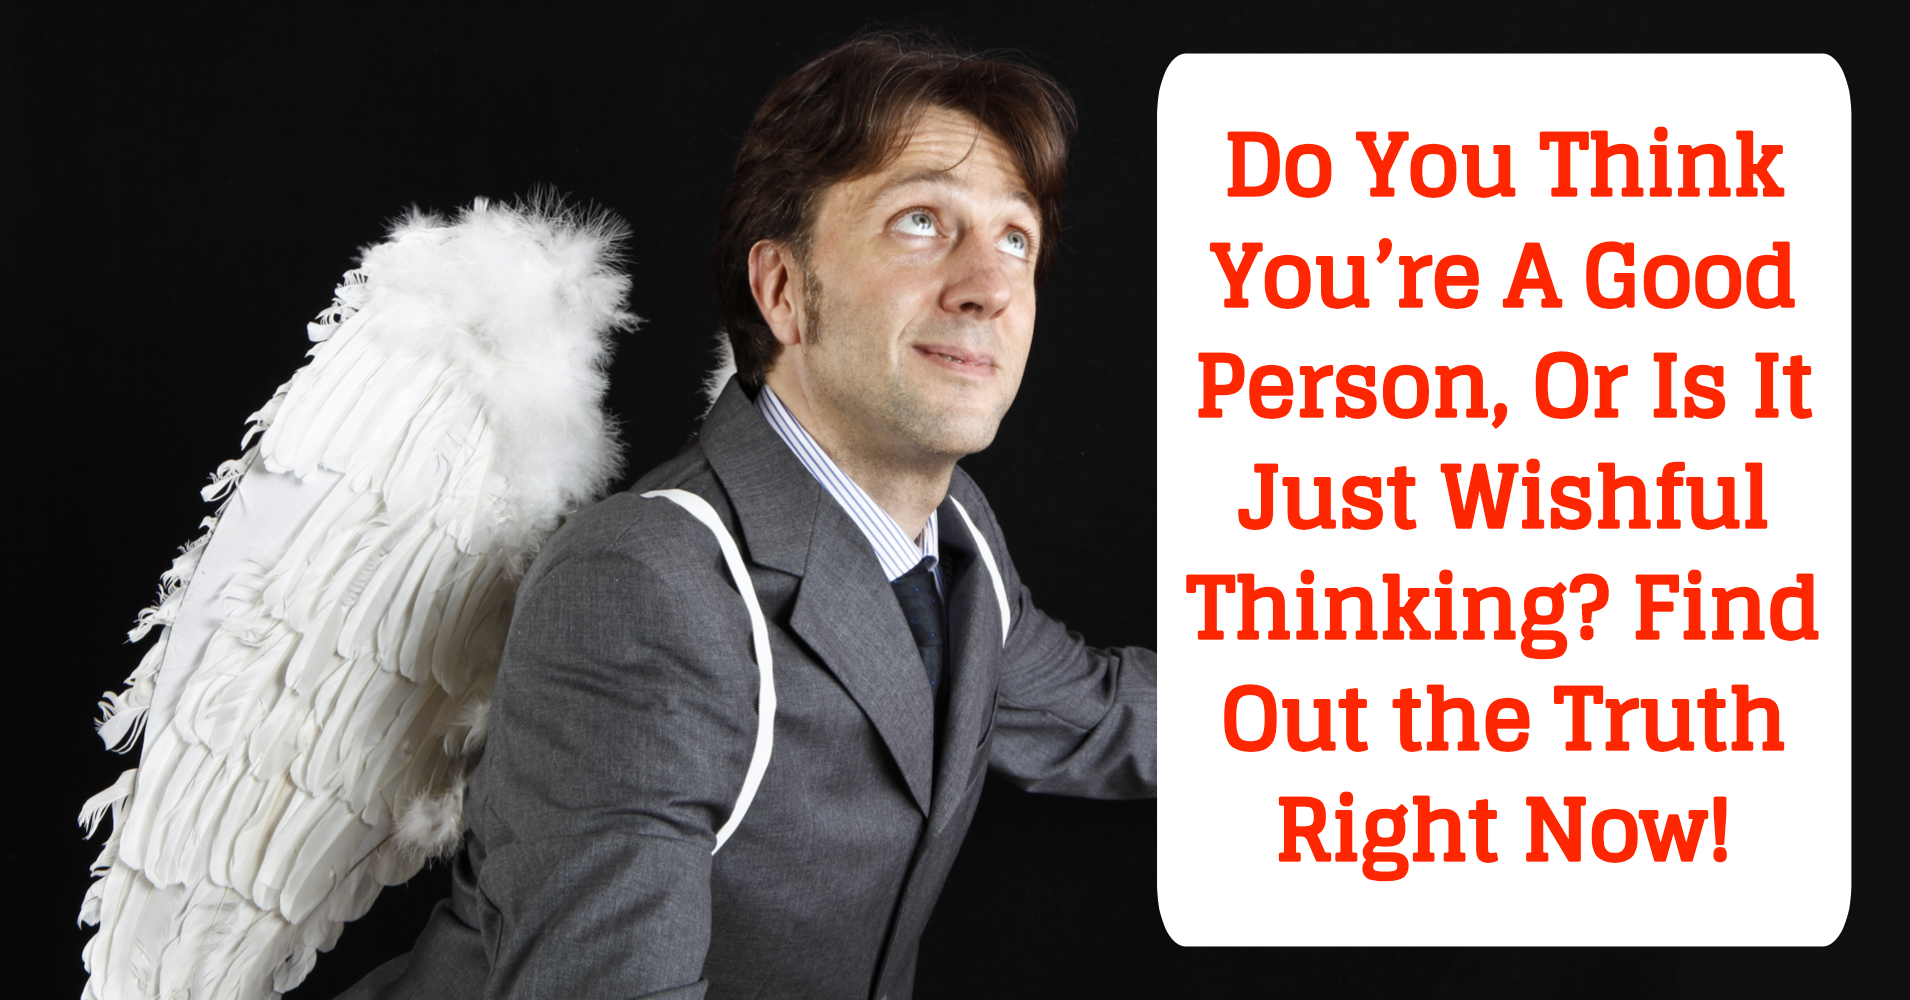 Are You a Good Person? - Quiz - Quizony.com